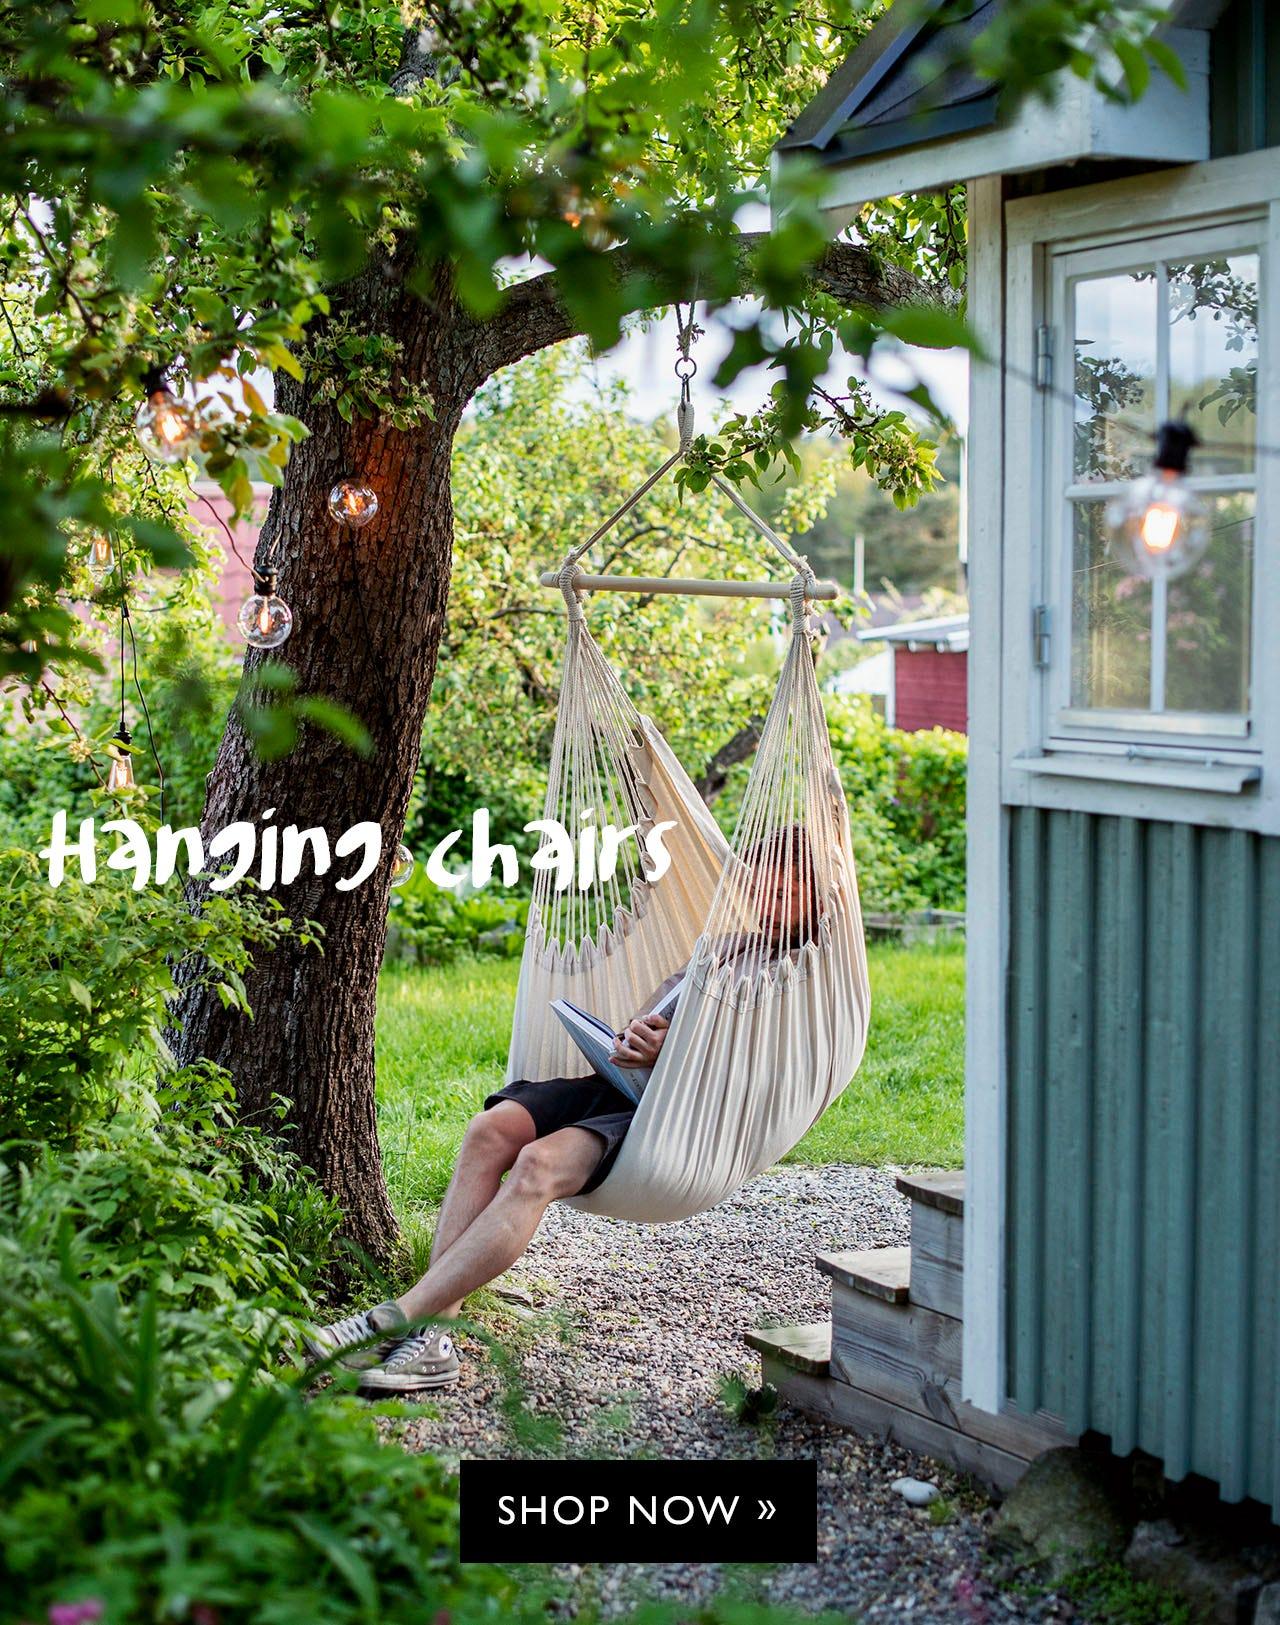 Hammocks, aning chairs, hanging hammocks